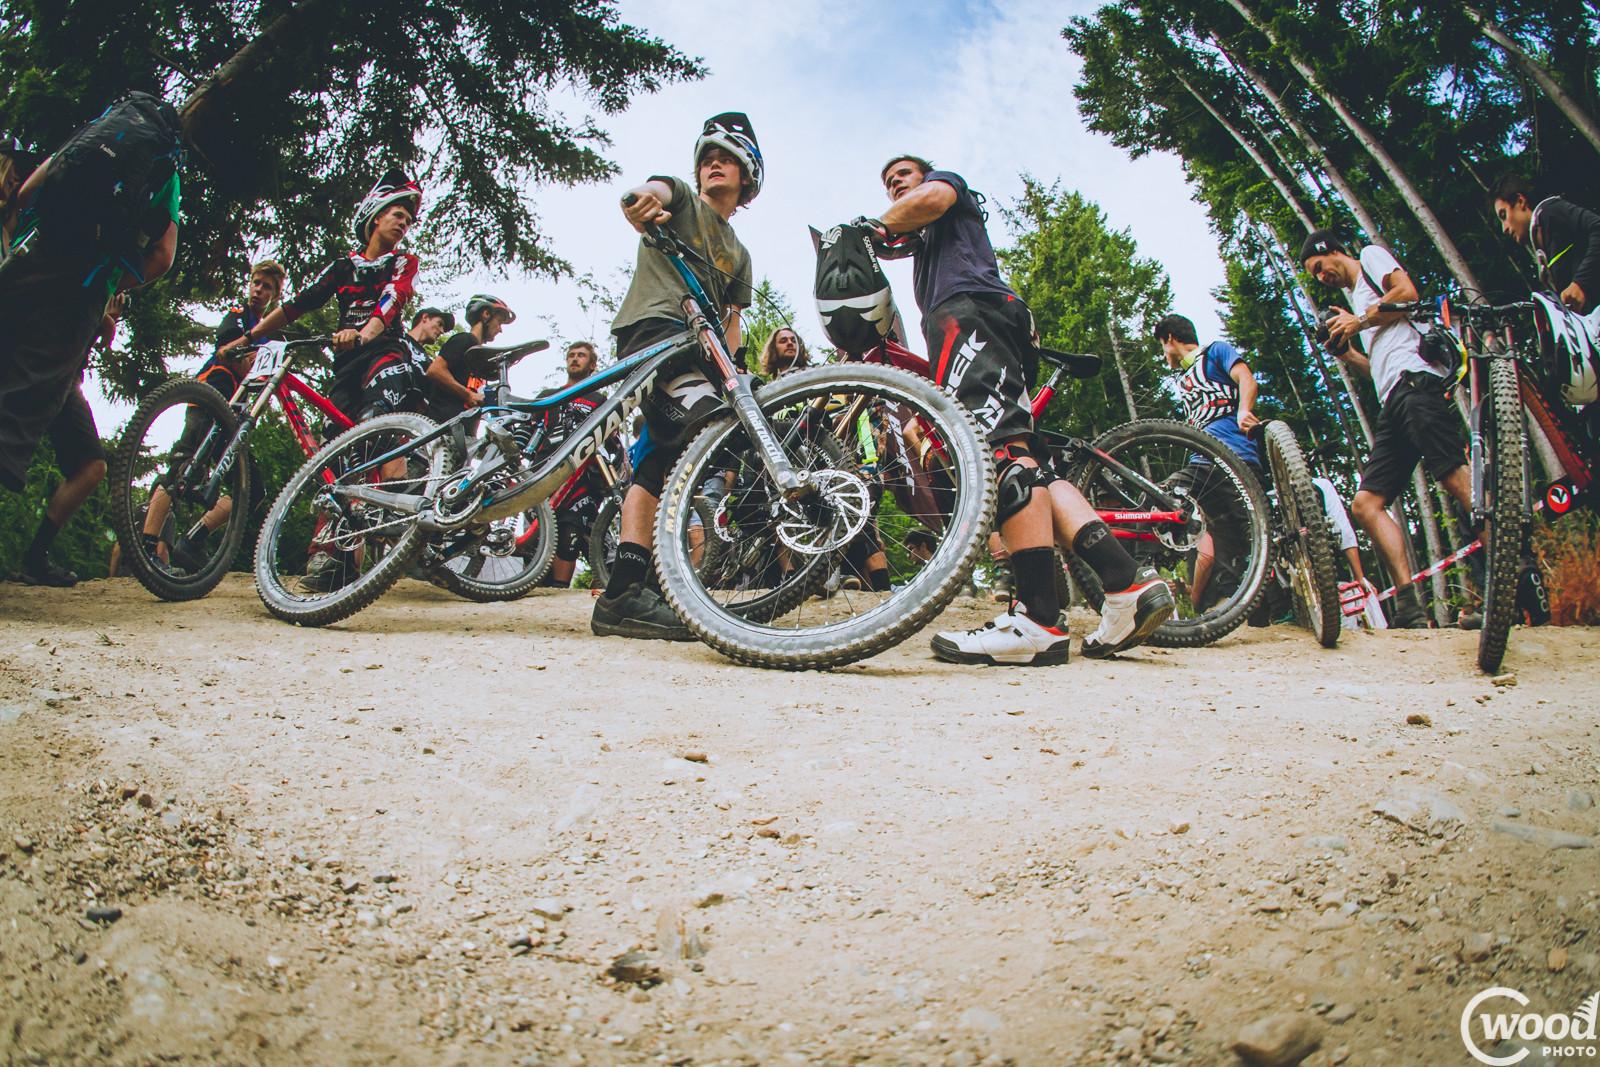 Ready to Drop - Vertigo Bikes Whip Off at the Atlas Bar Wynyard Jam - Mountain Biking Pictures - Vital MTB